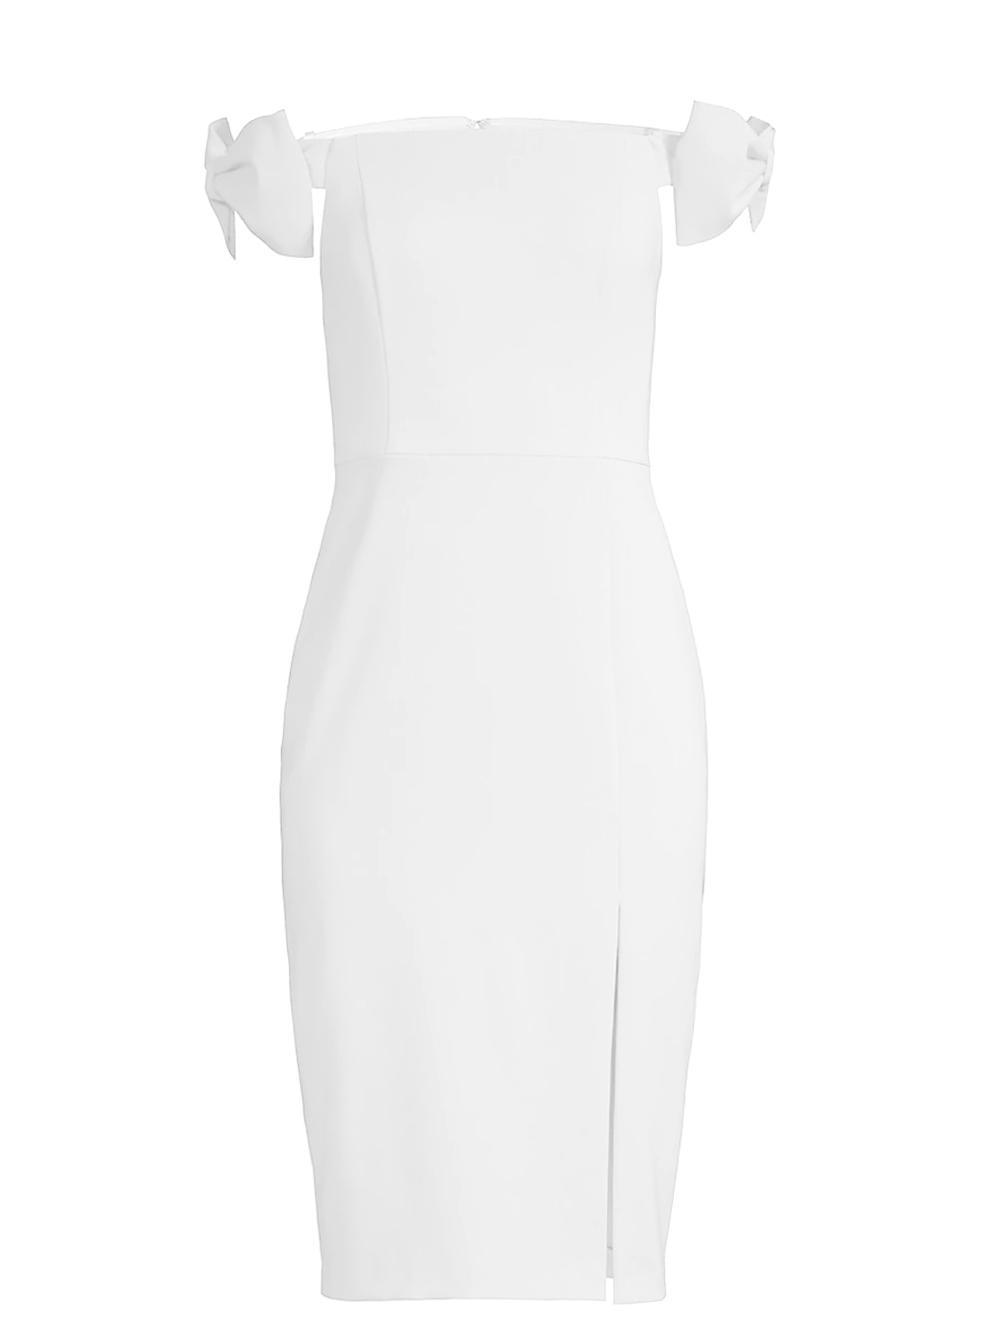 Bow Shoulder Detail Sheath Dress Item # MN1E206372